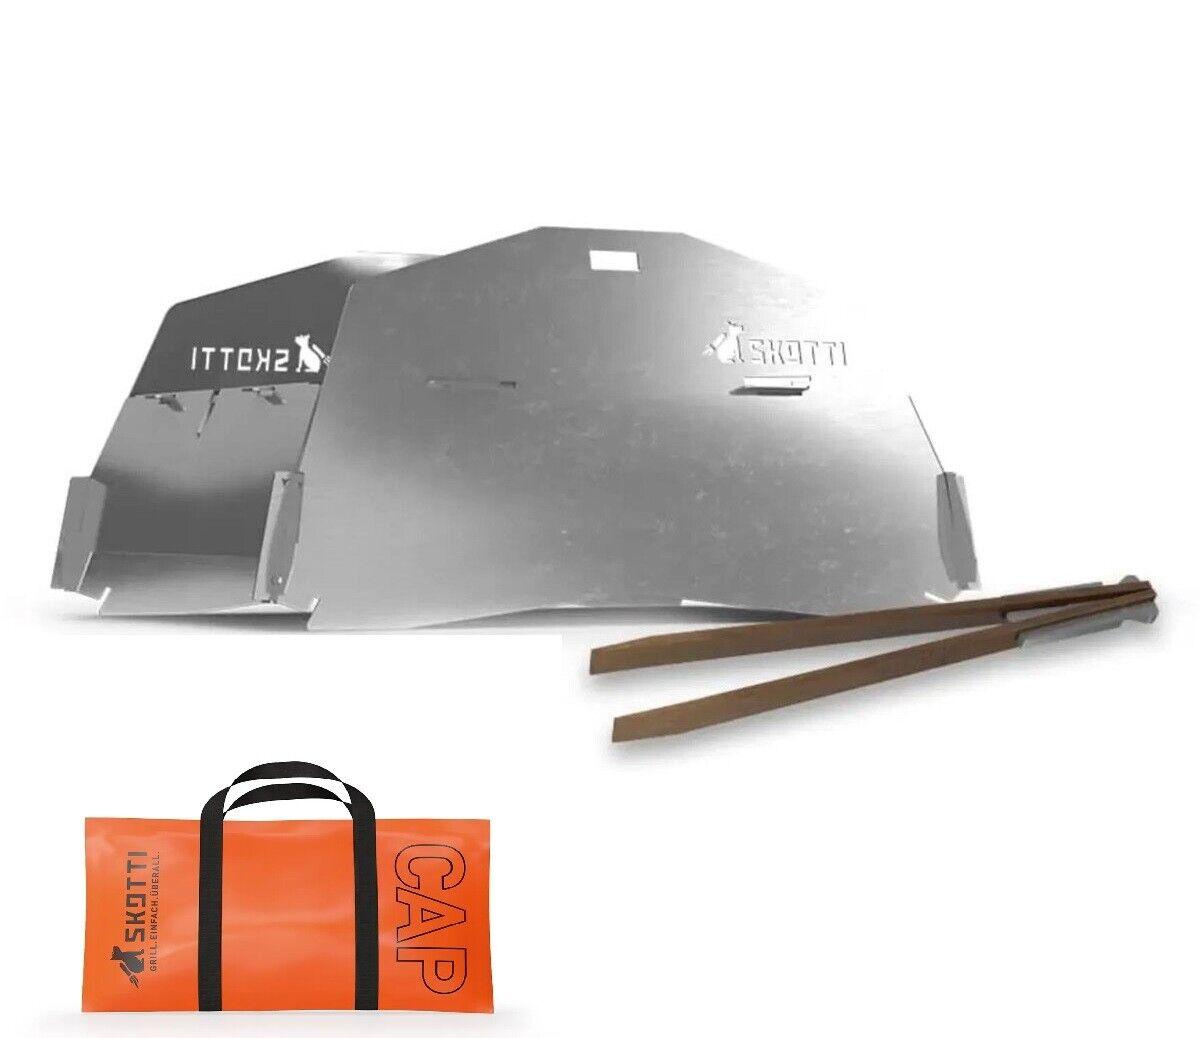 Skotti-CAP inkl.Transporttasche,für SKOTTI Gasgrill,Tischgrill,Campinggrill